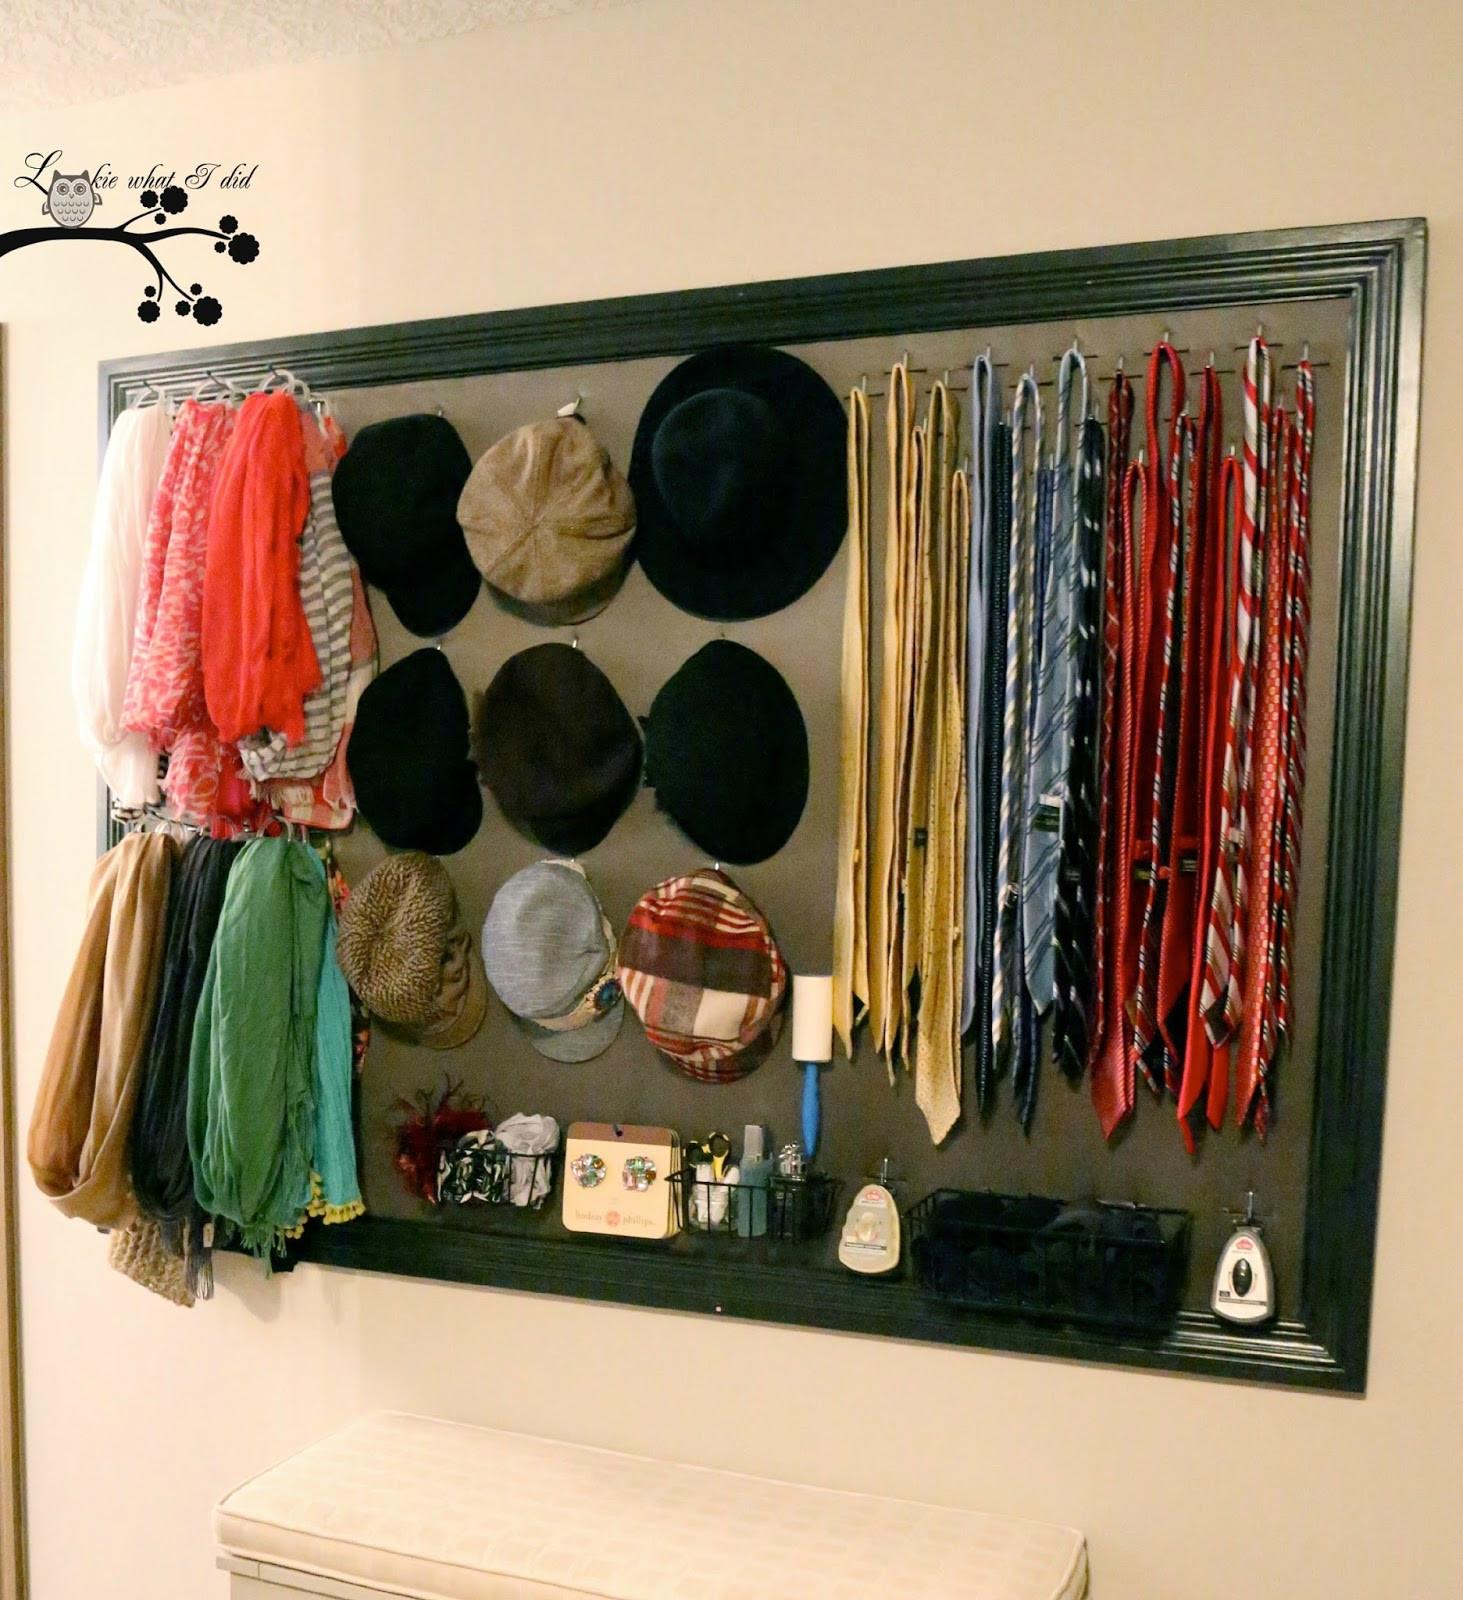 DIY Closet Organizer Ideas  Lookie What I Did His and Her Closet Organizer